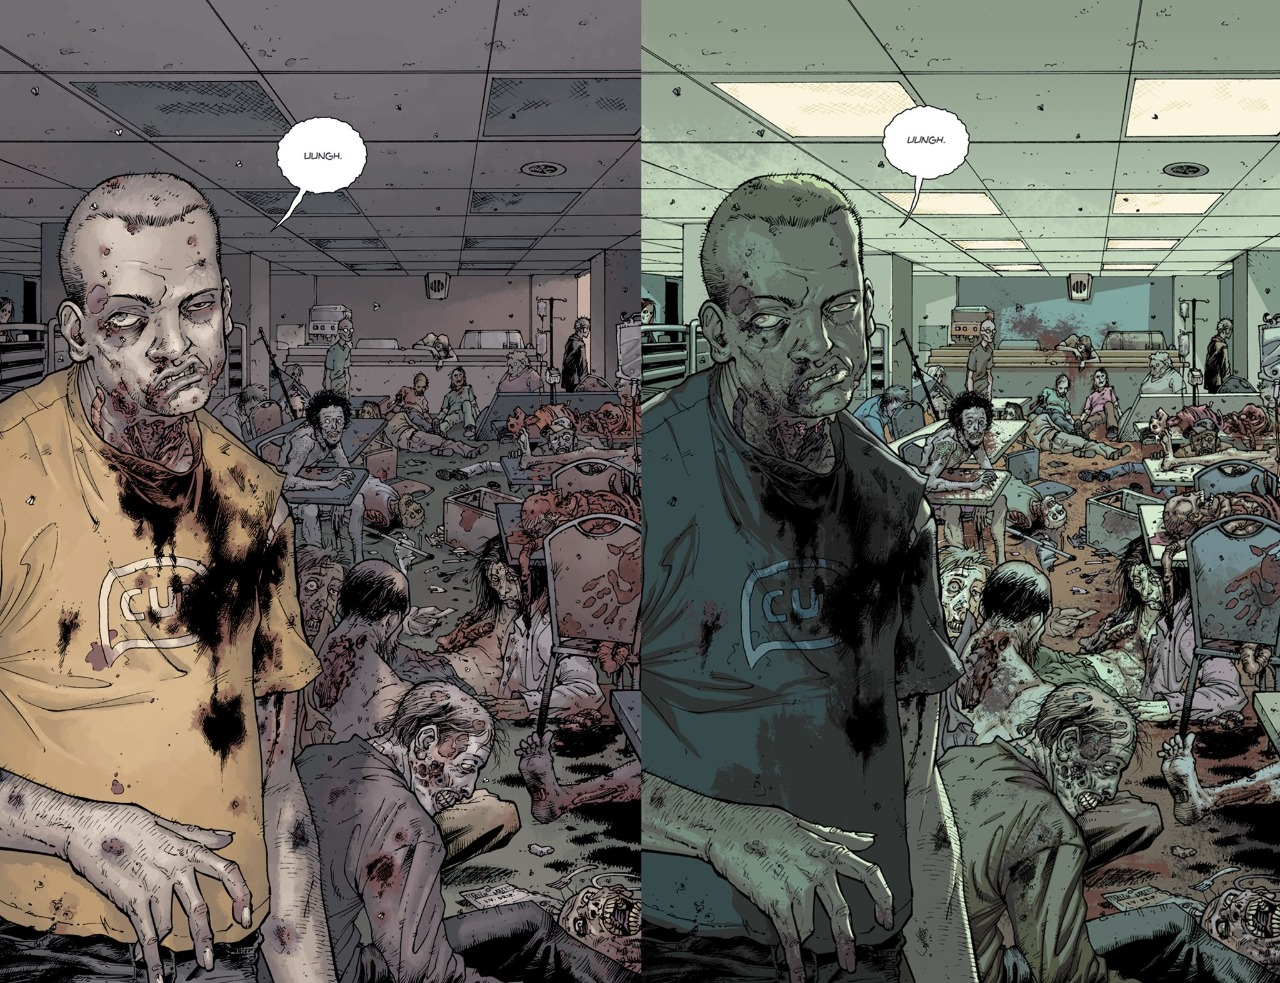 The-Walking-Dead-Deluxe-colorida-comparação-03